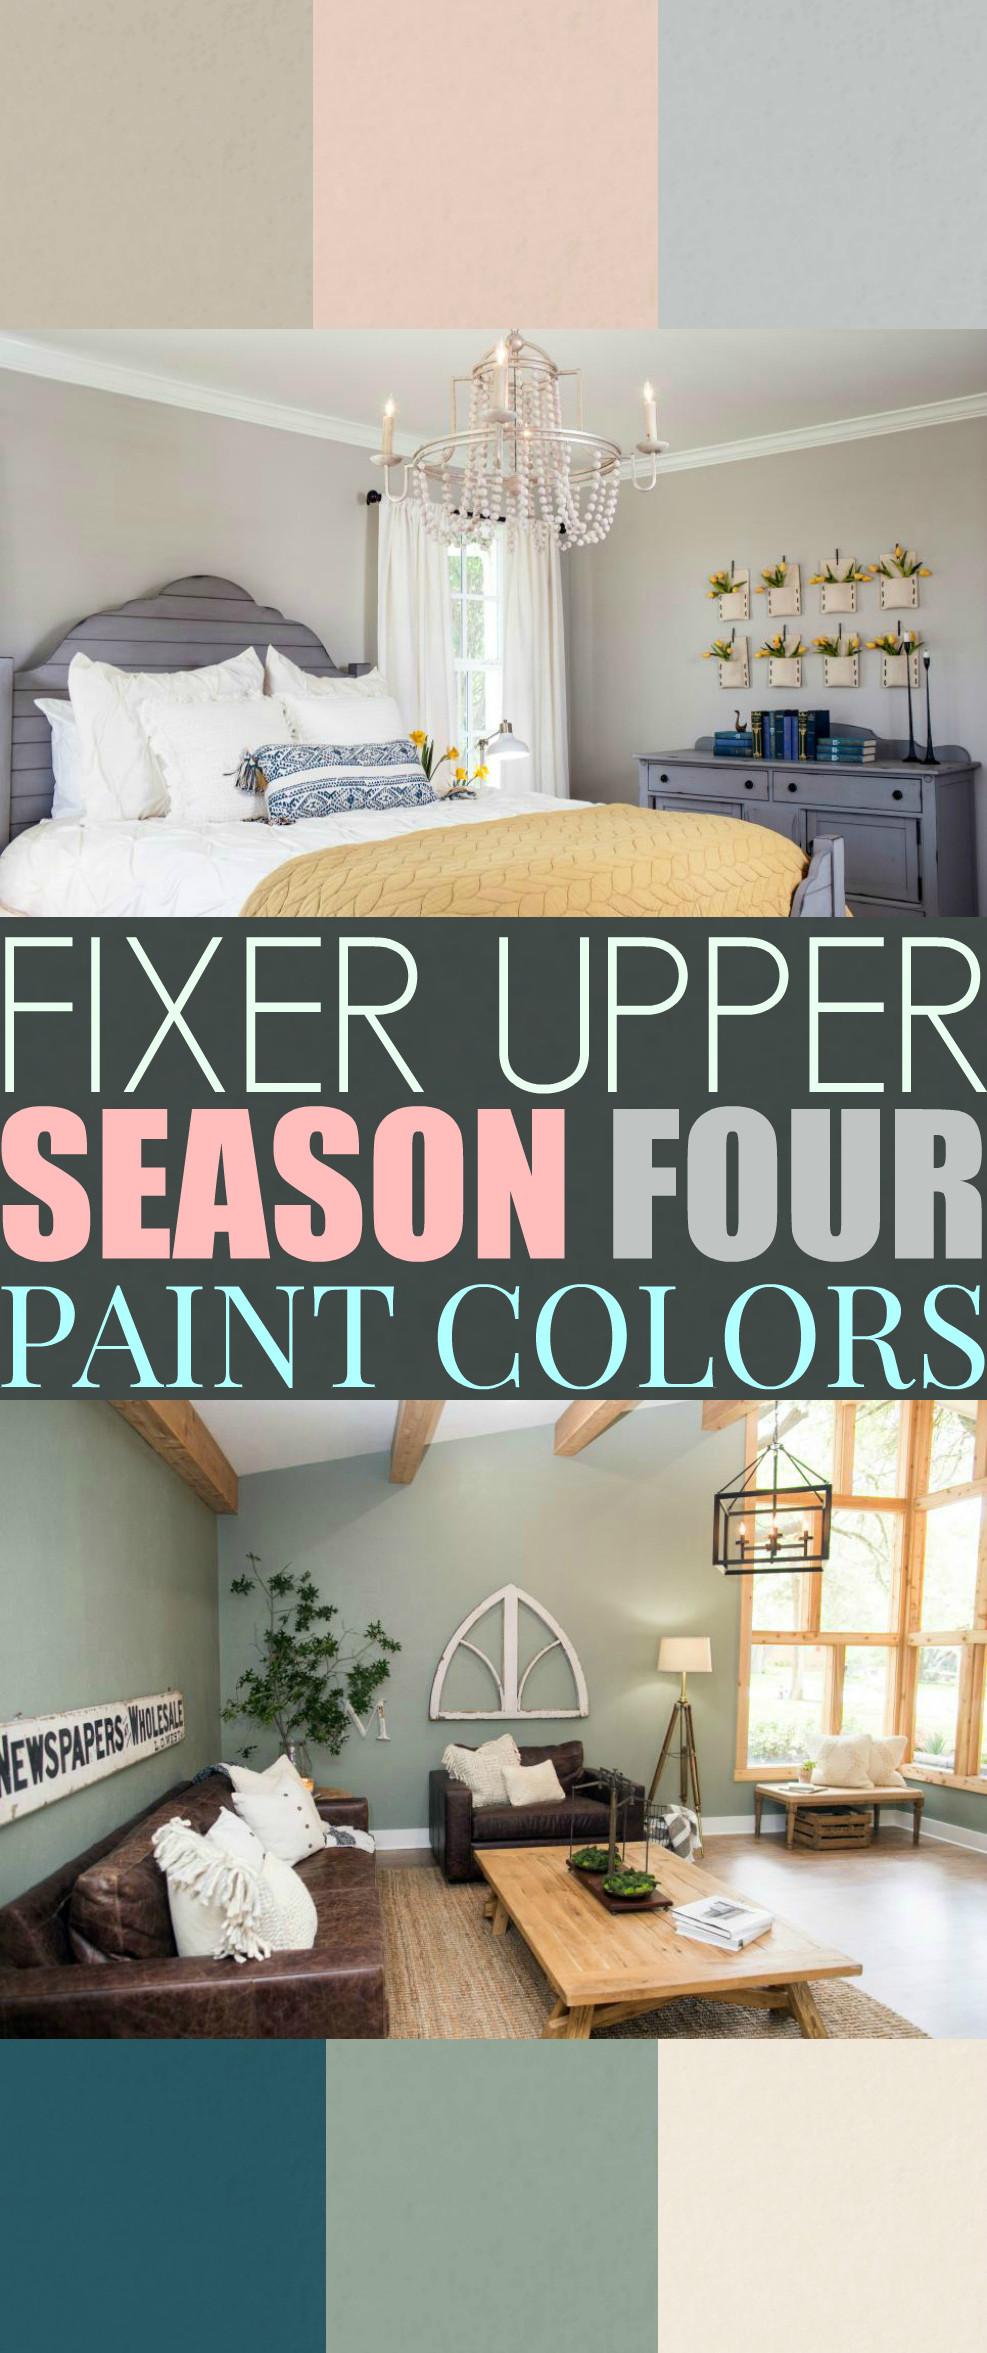 Best ideas about Fixer Upper Paint Colors . Save or Pin Fixer Upper Bedroom Paint Colors Now.